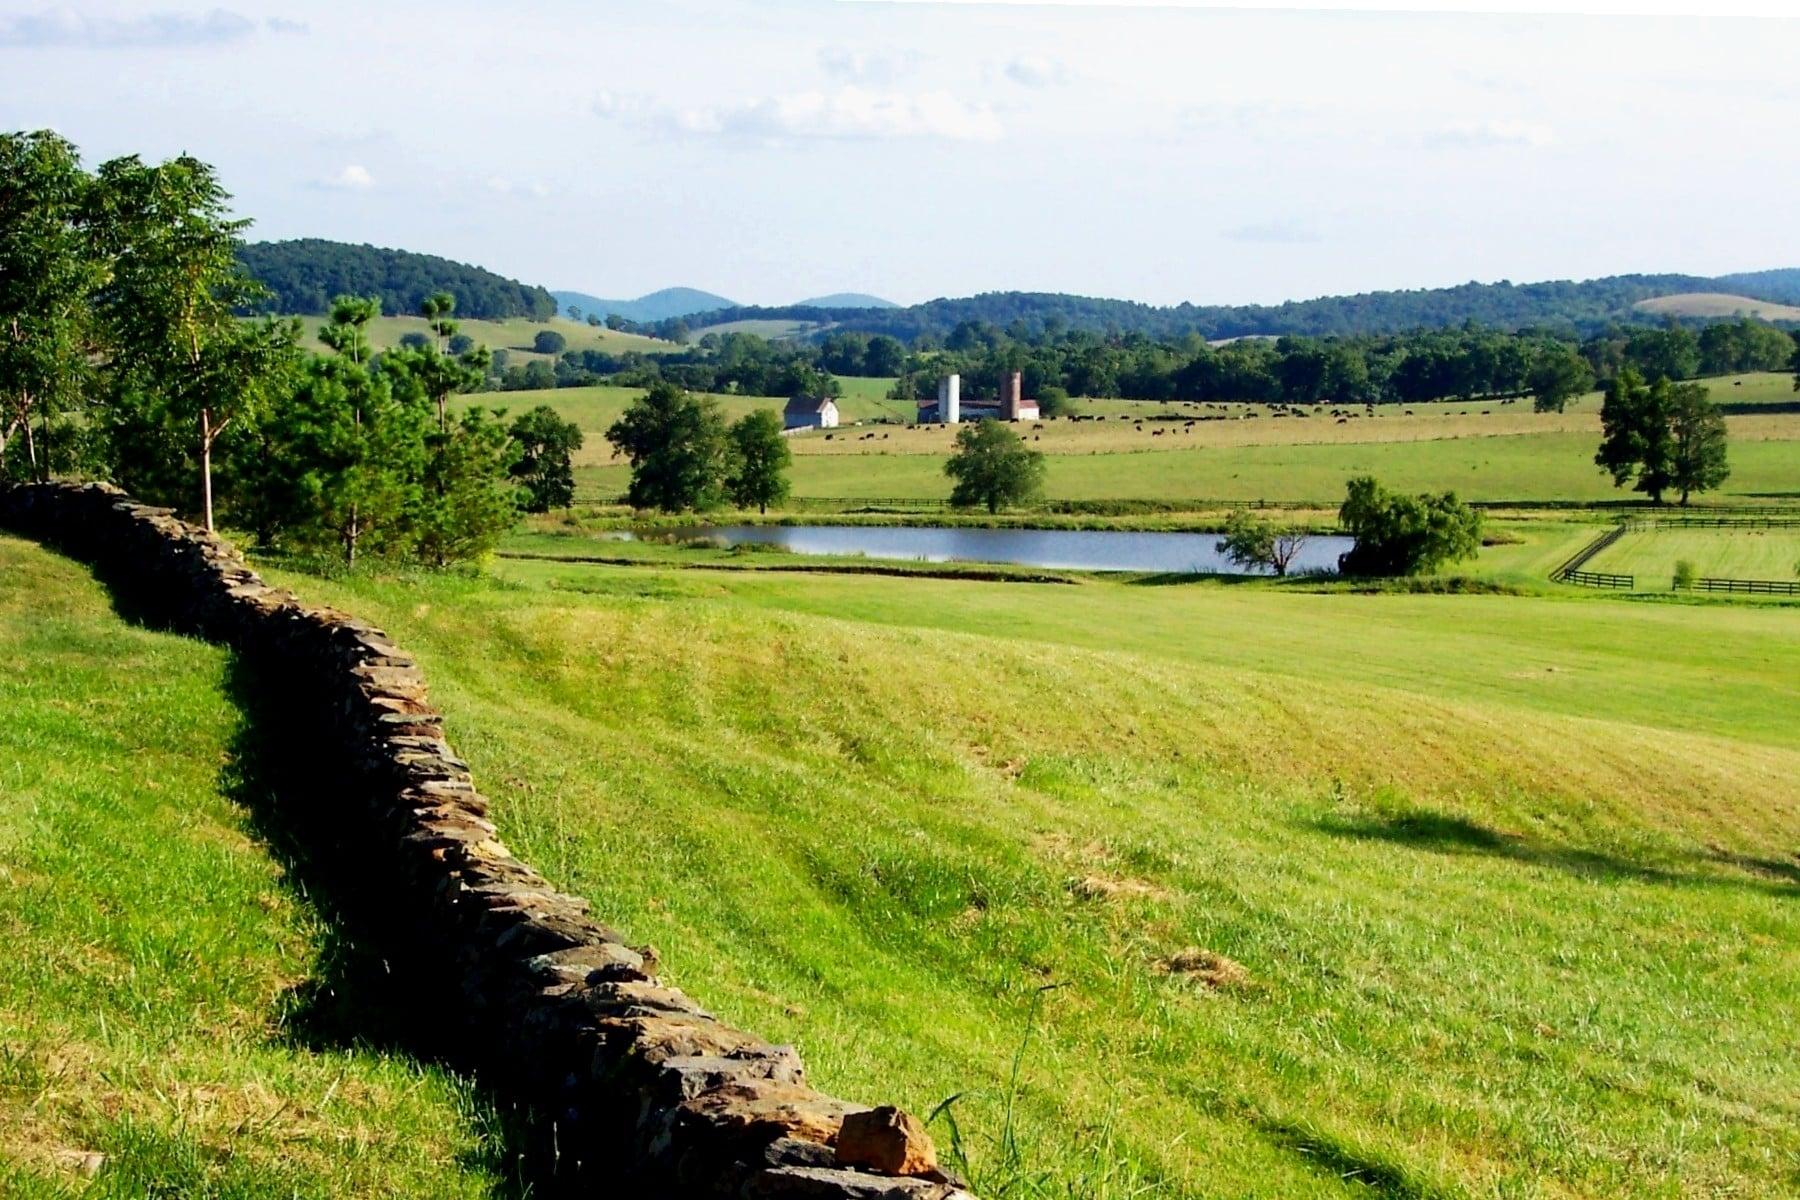 Ovoka Farm overlooking Crooked Run Valley near Paris, Fauquier County.